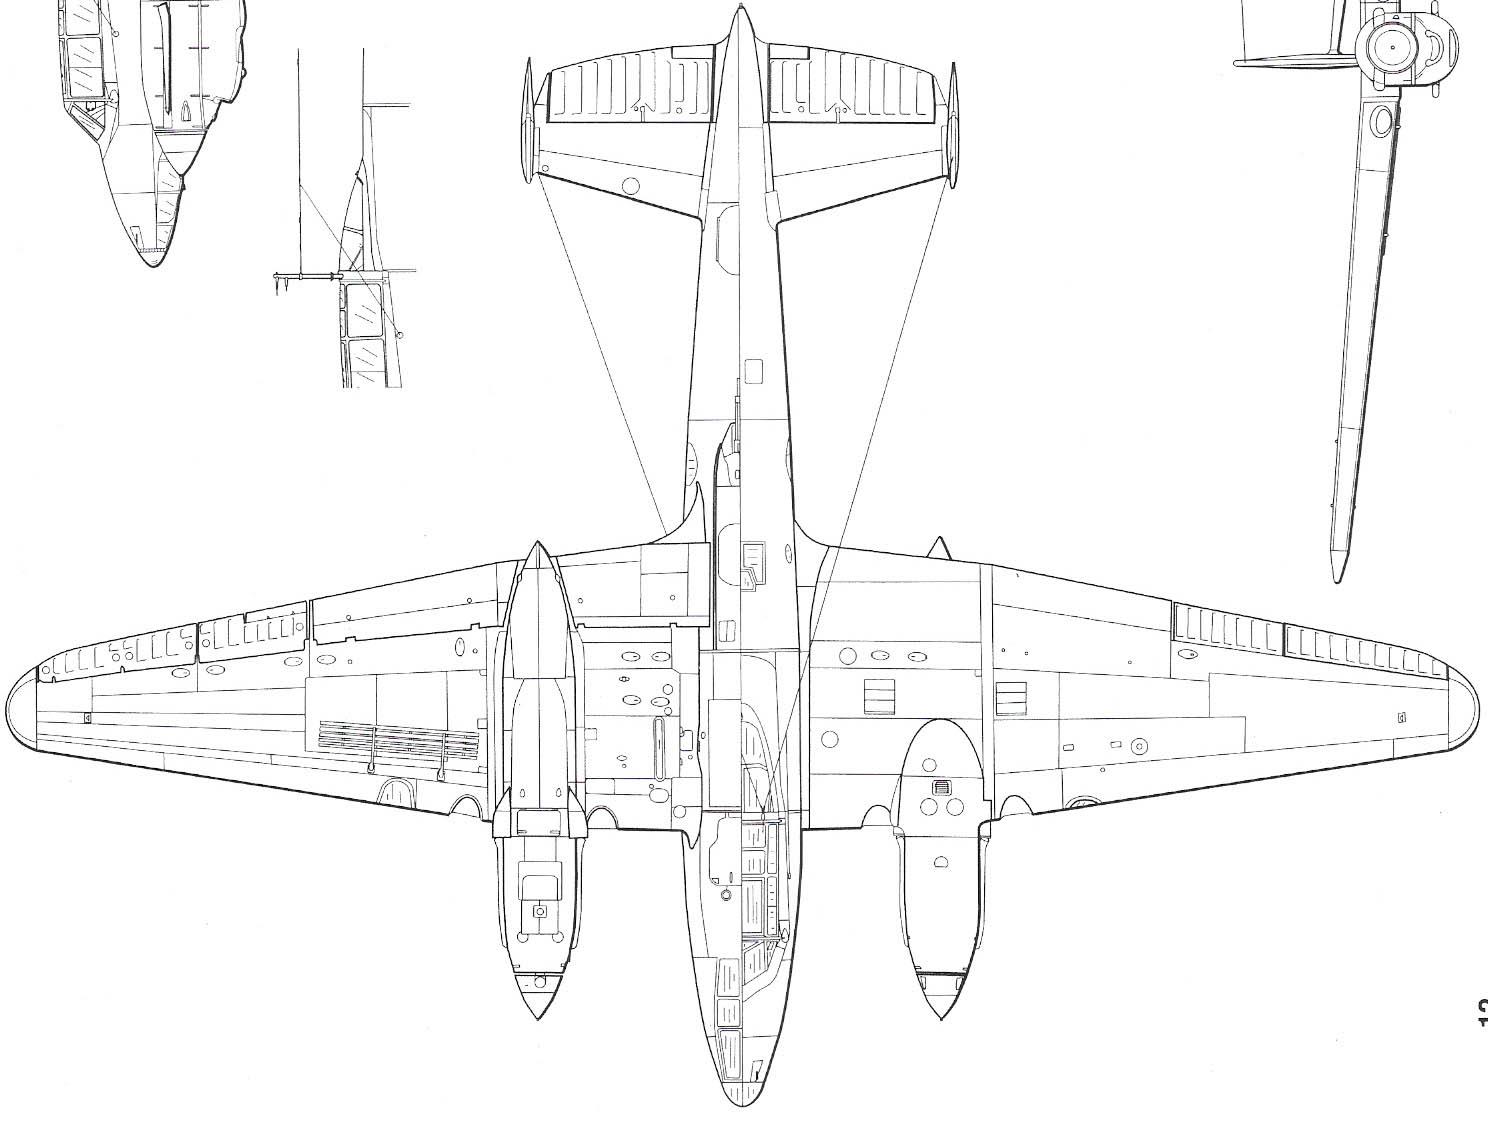 rc glider wiring diagram wiring diagram database  fpv plane wiring diagram wiring diagram database wiring diagram for rc aircraft rc airplane diagram wiring